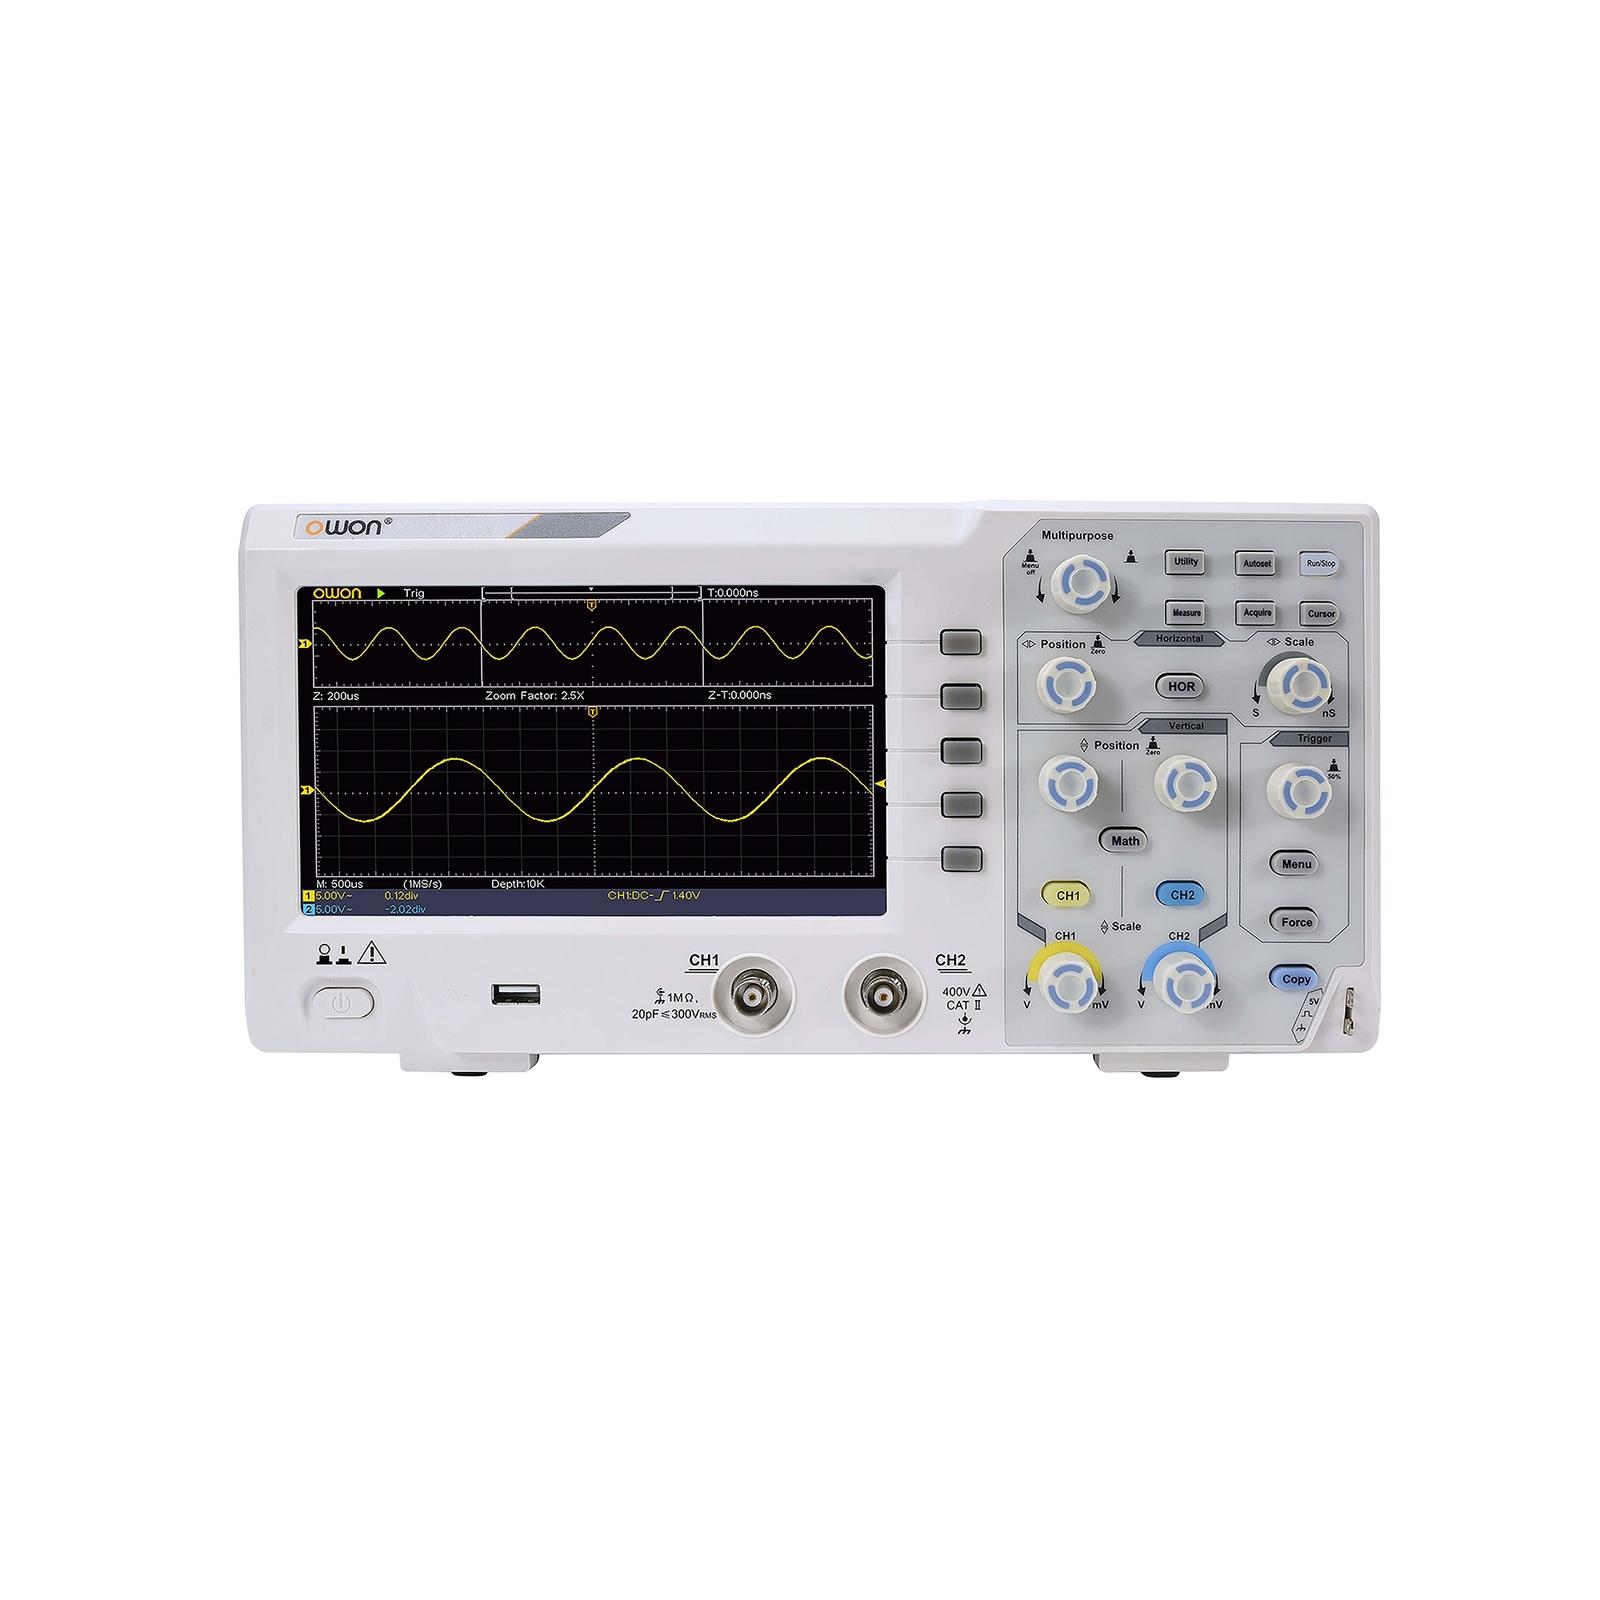 Sds1022 Oscilloscope